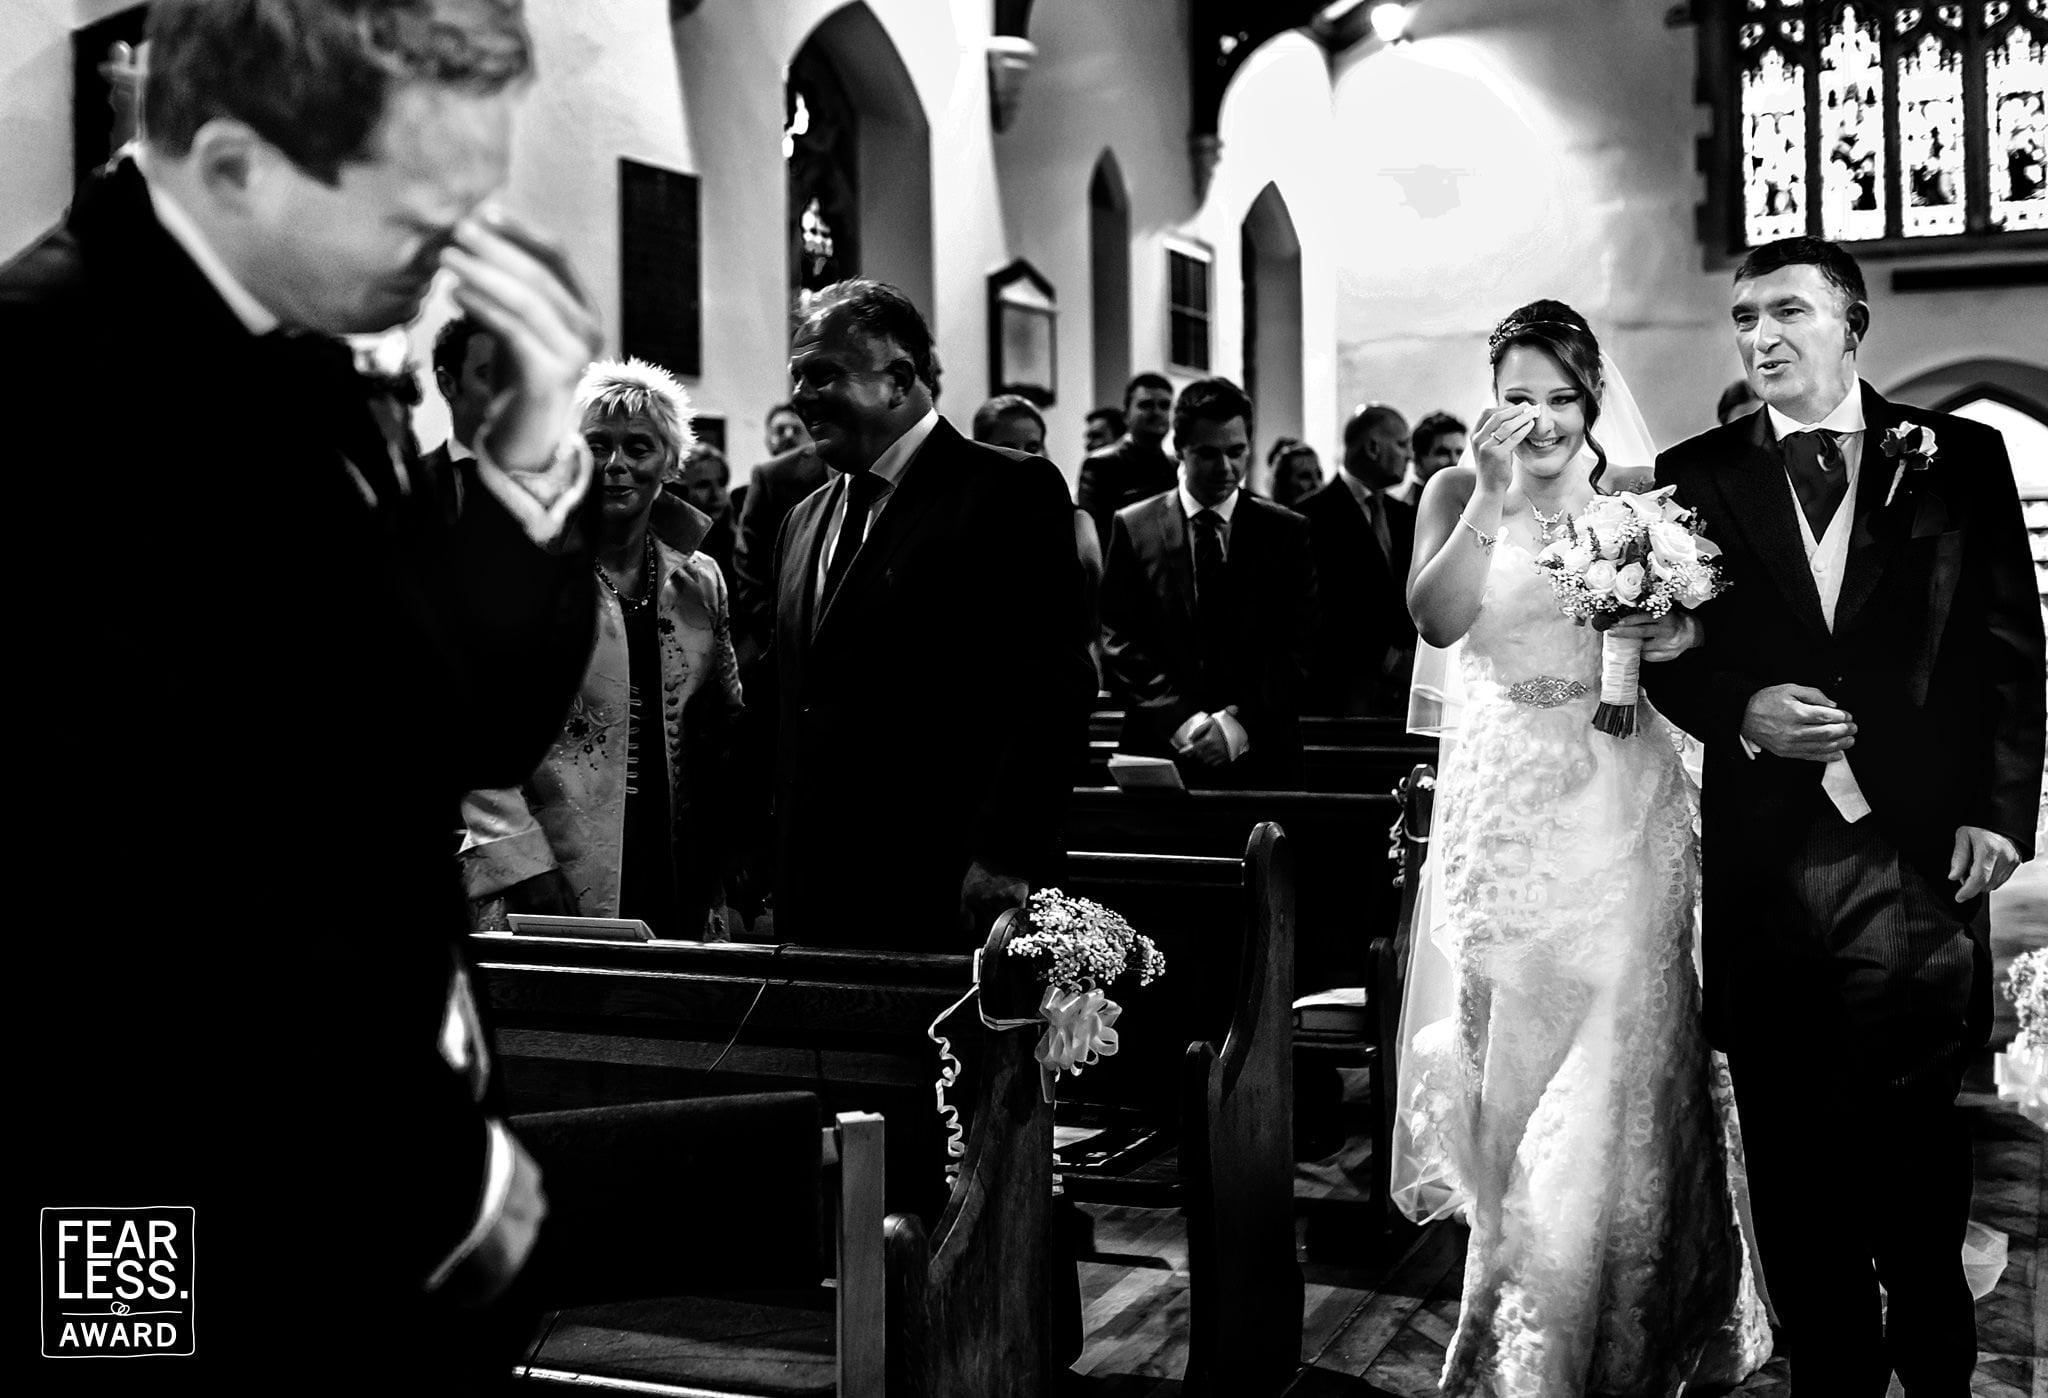 Winchester Wedding Photographer Fearless Photographers Award